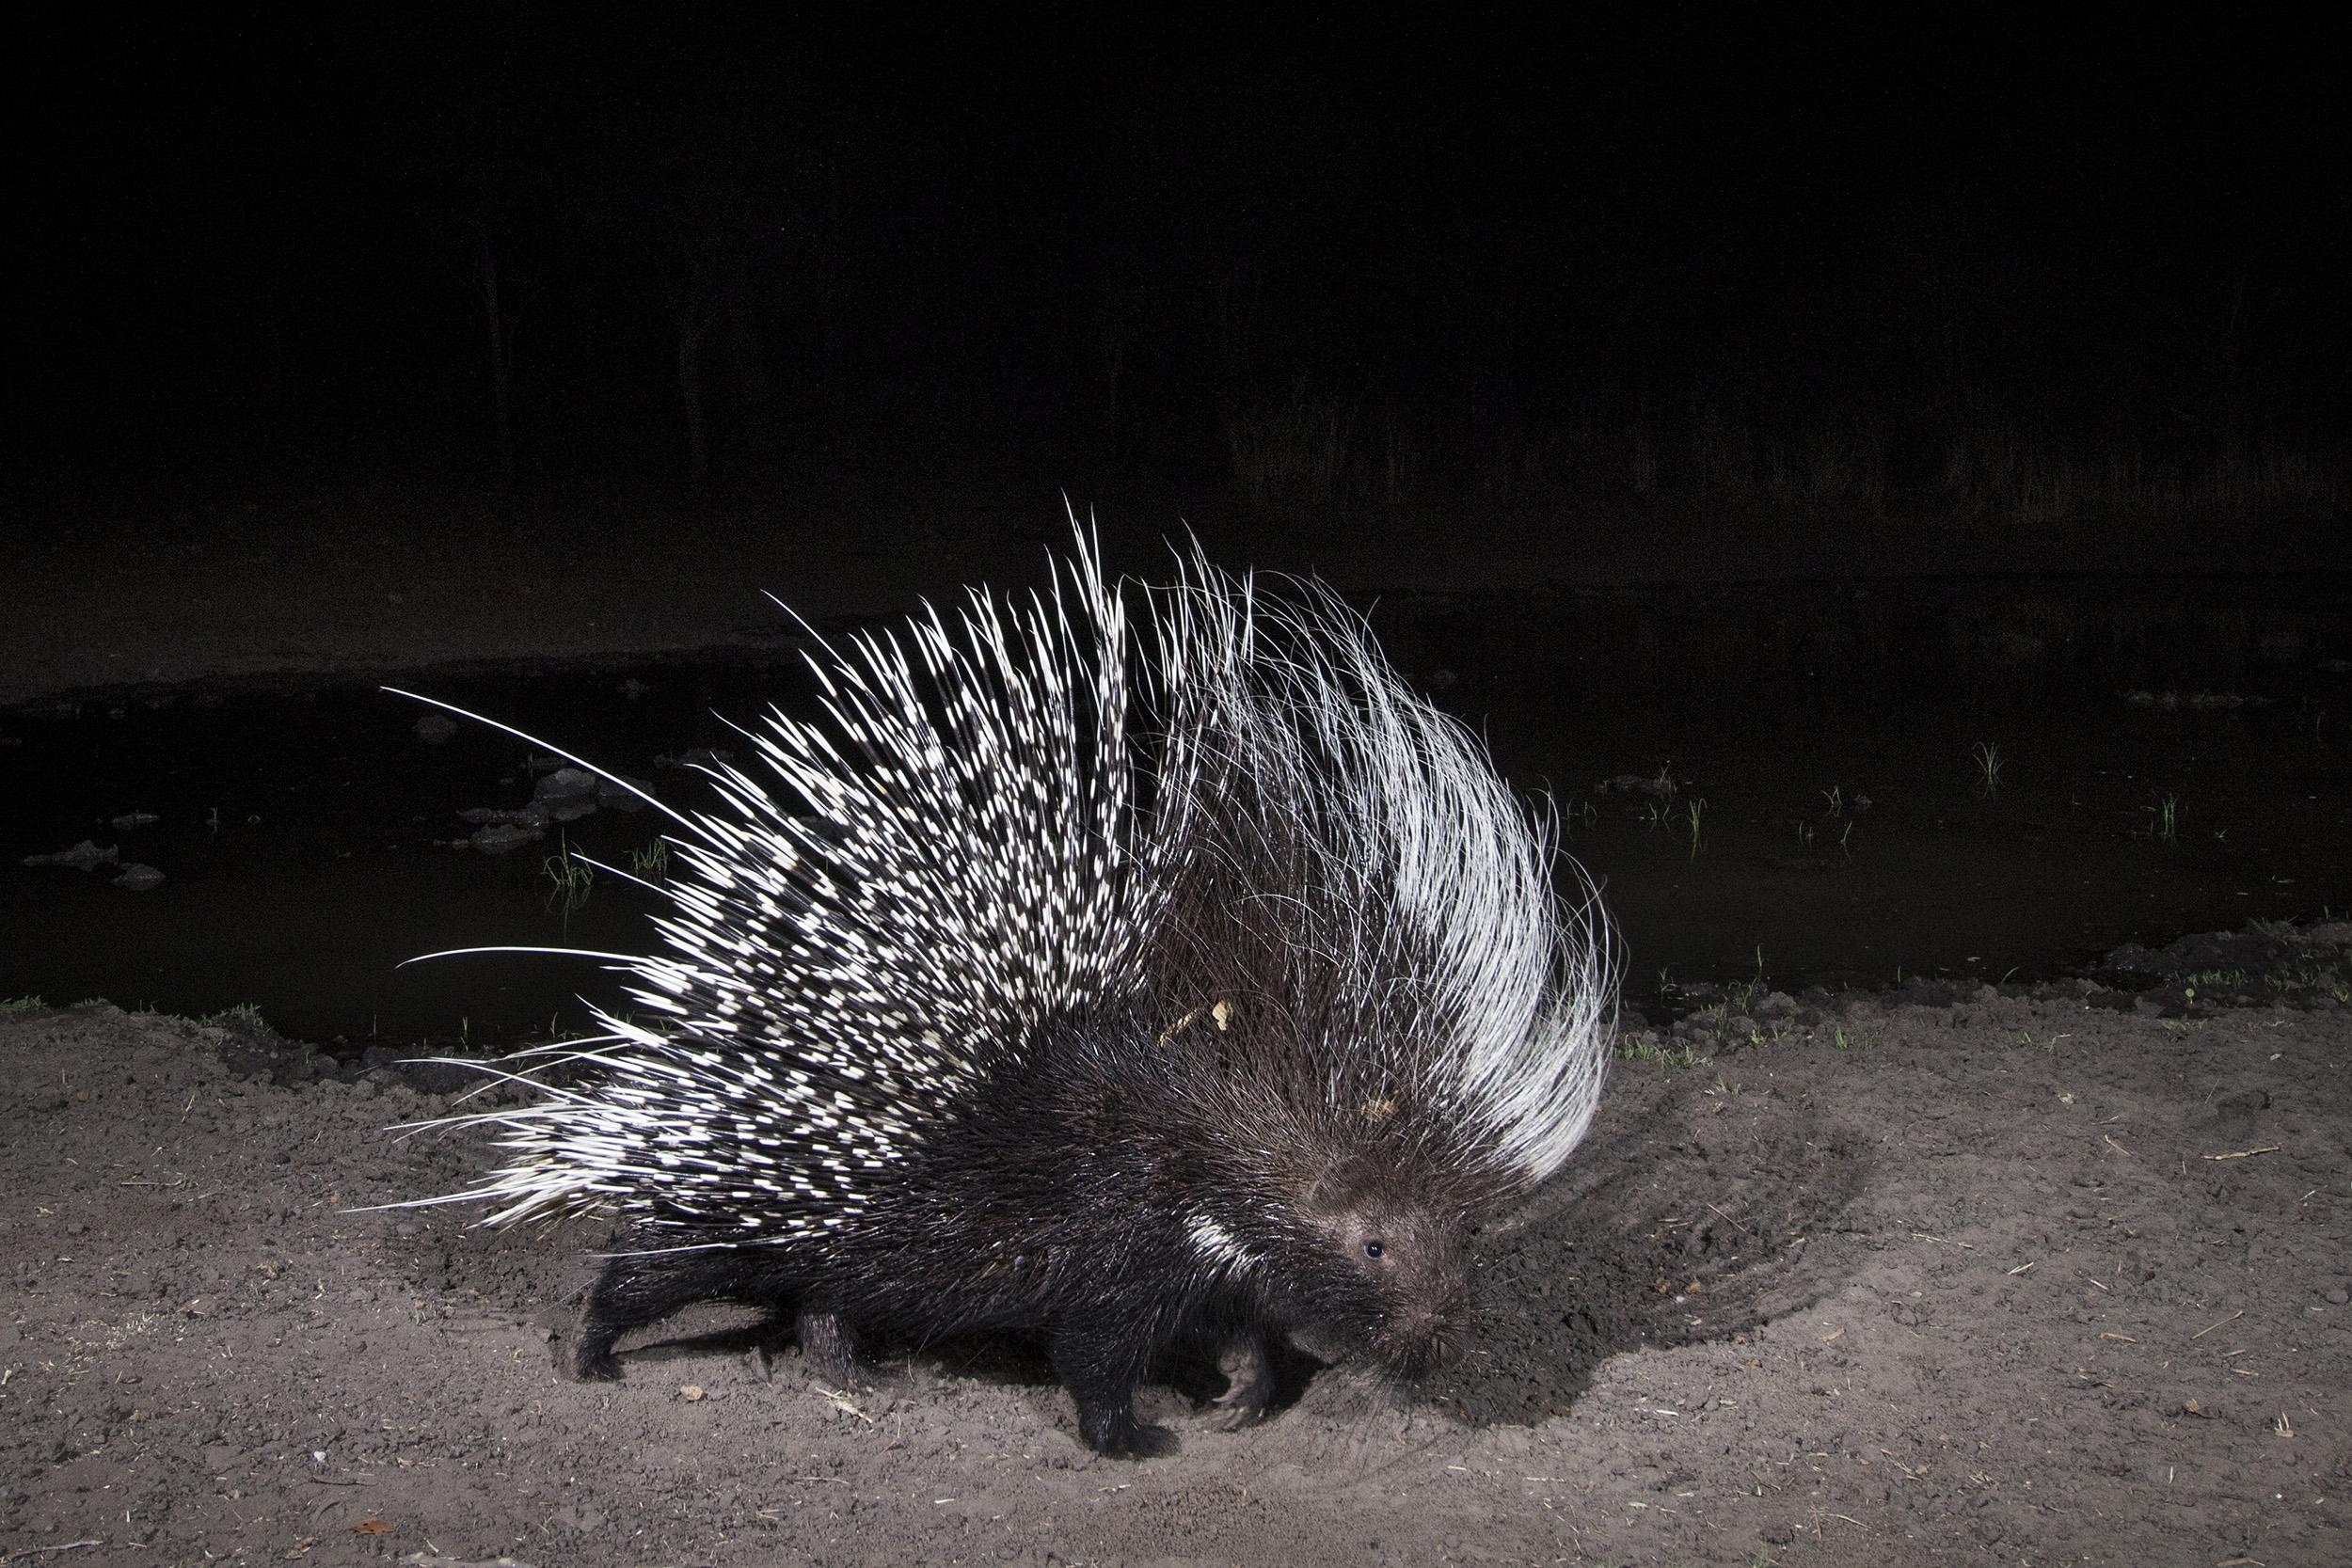 A camera trap image of a porcupine using Camtraptions PIR motion sensor.